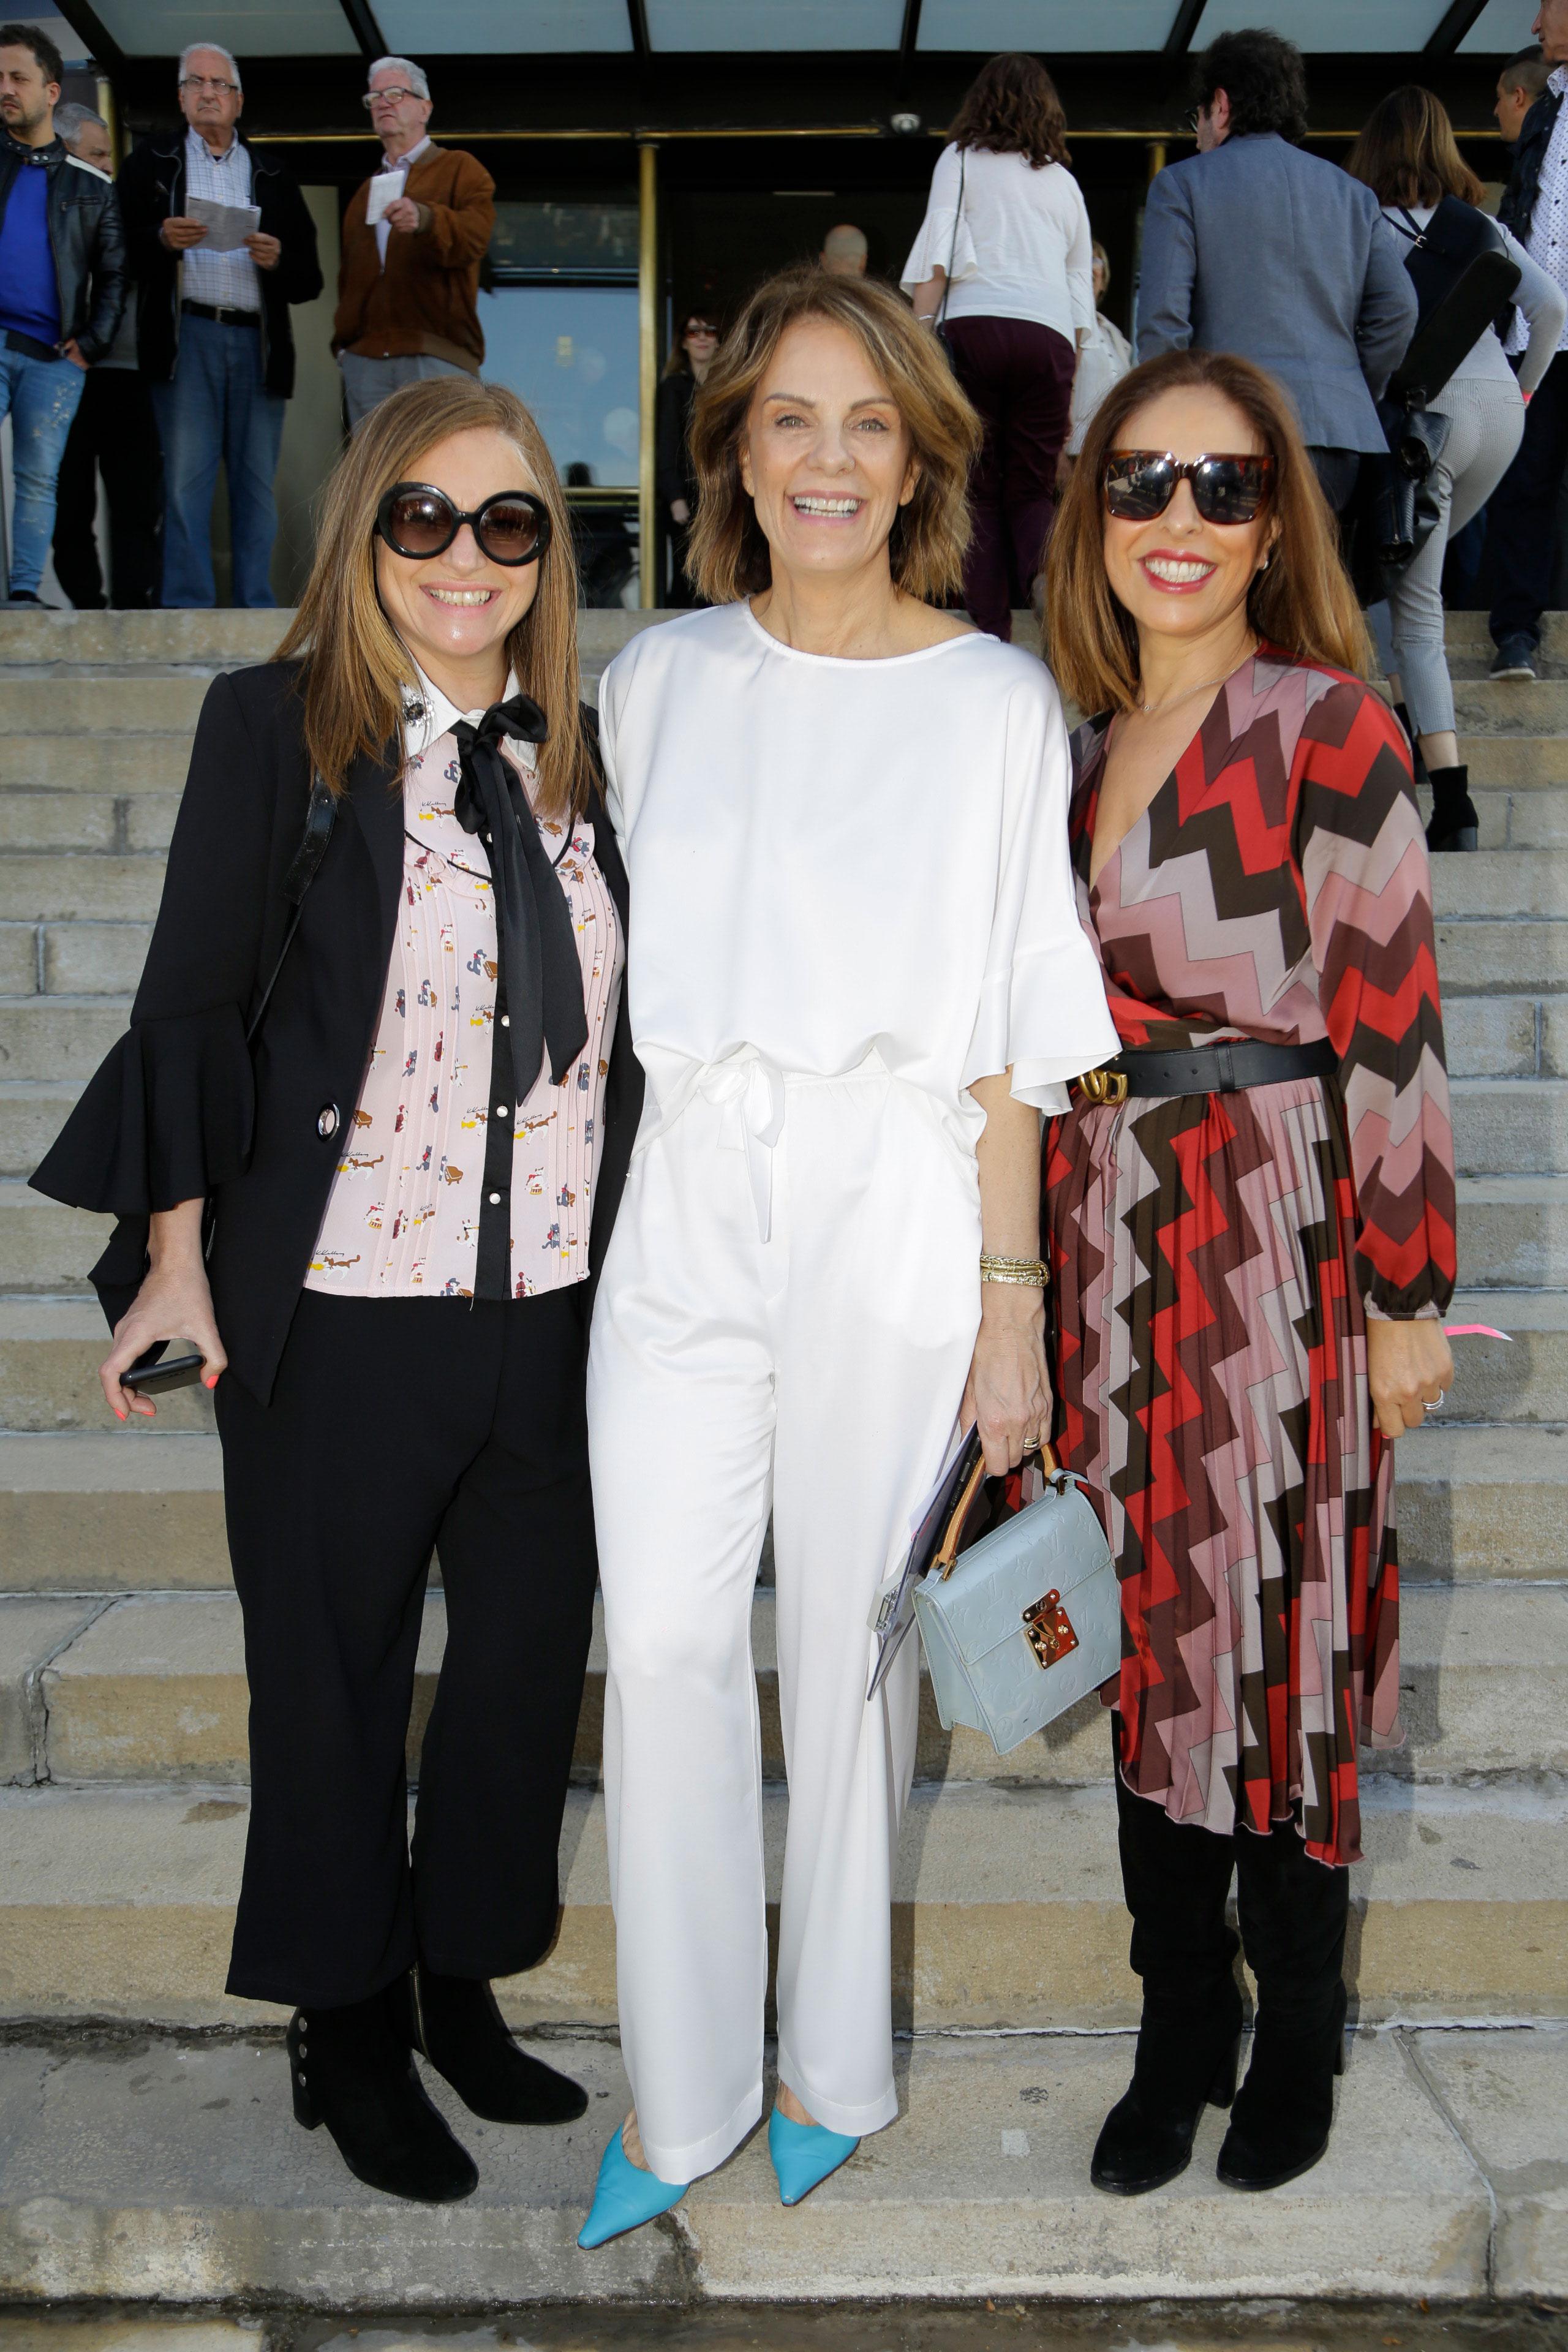 Gabriela Vidal, productora general del evento, junto a Nequi Galotti y Rosana Bertone